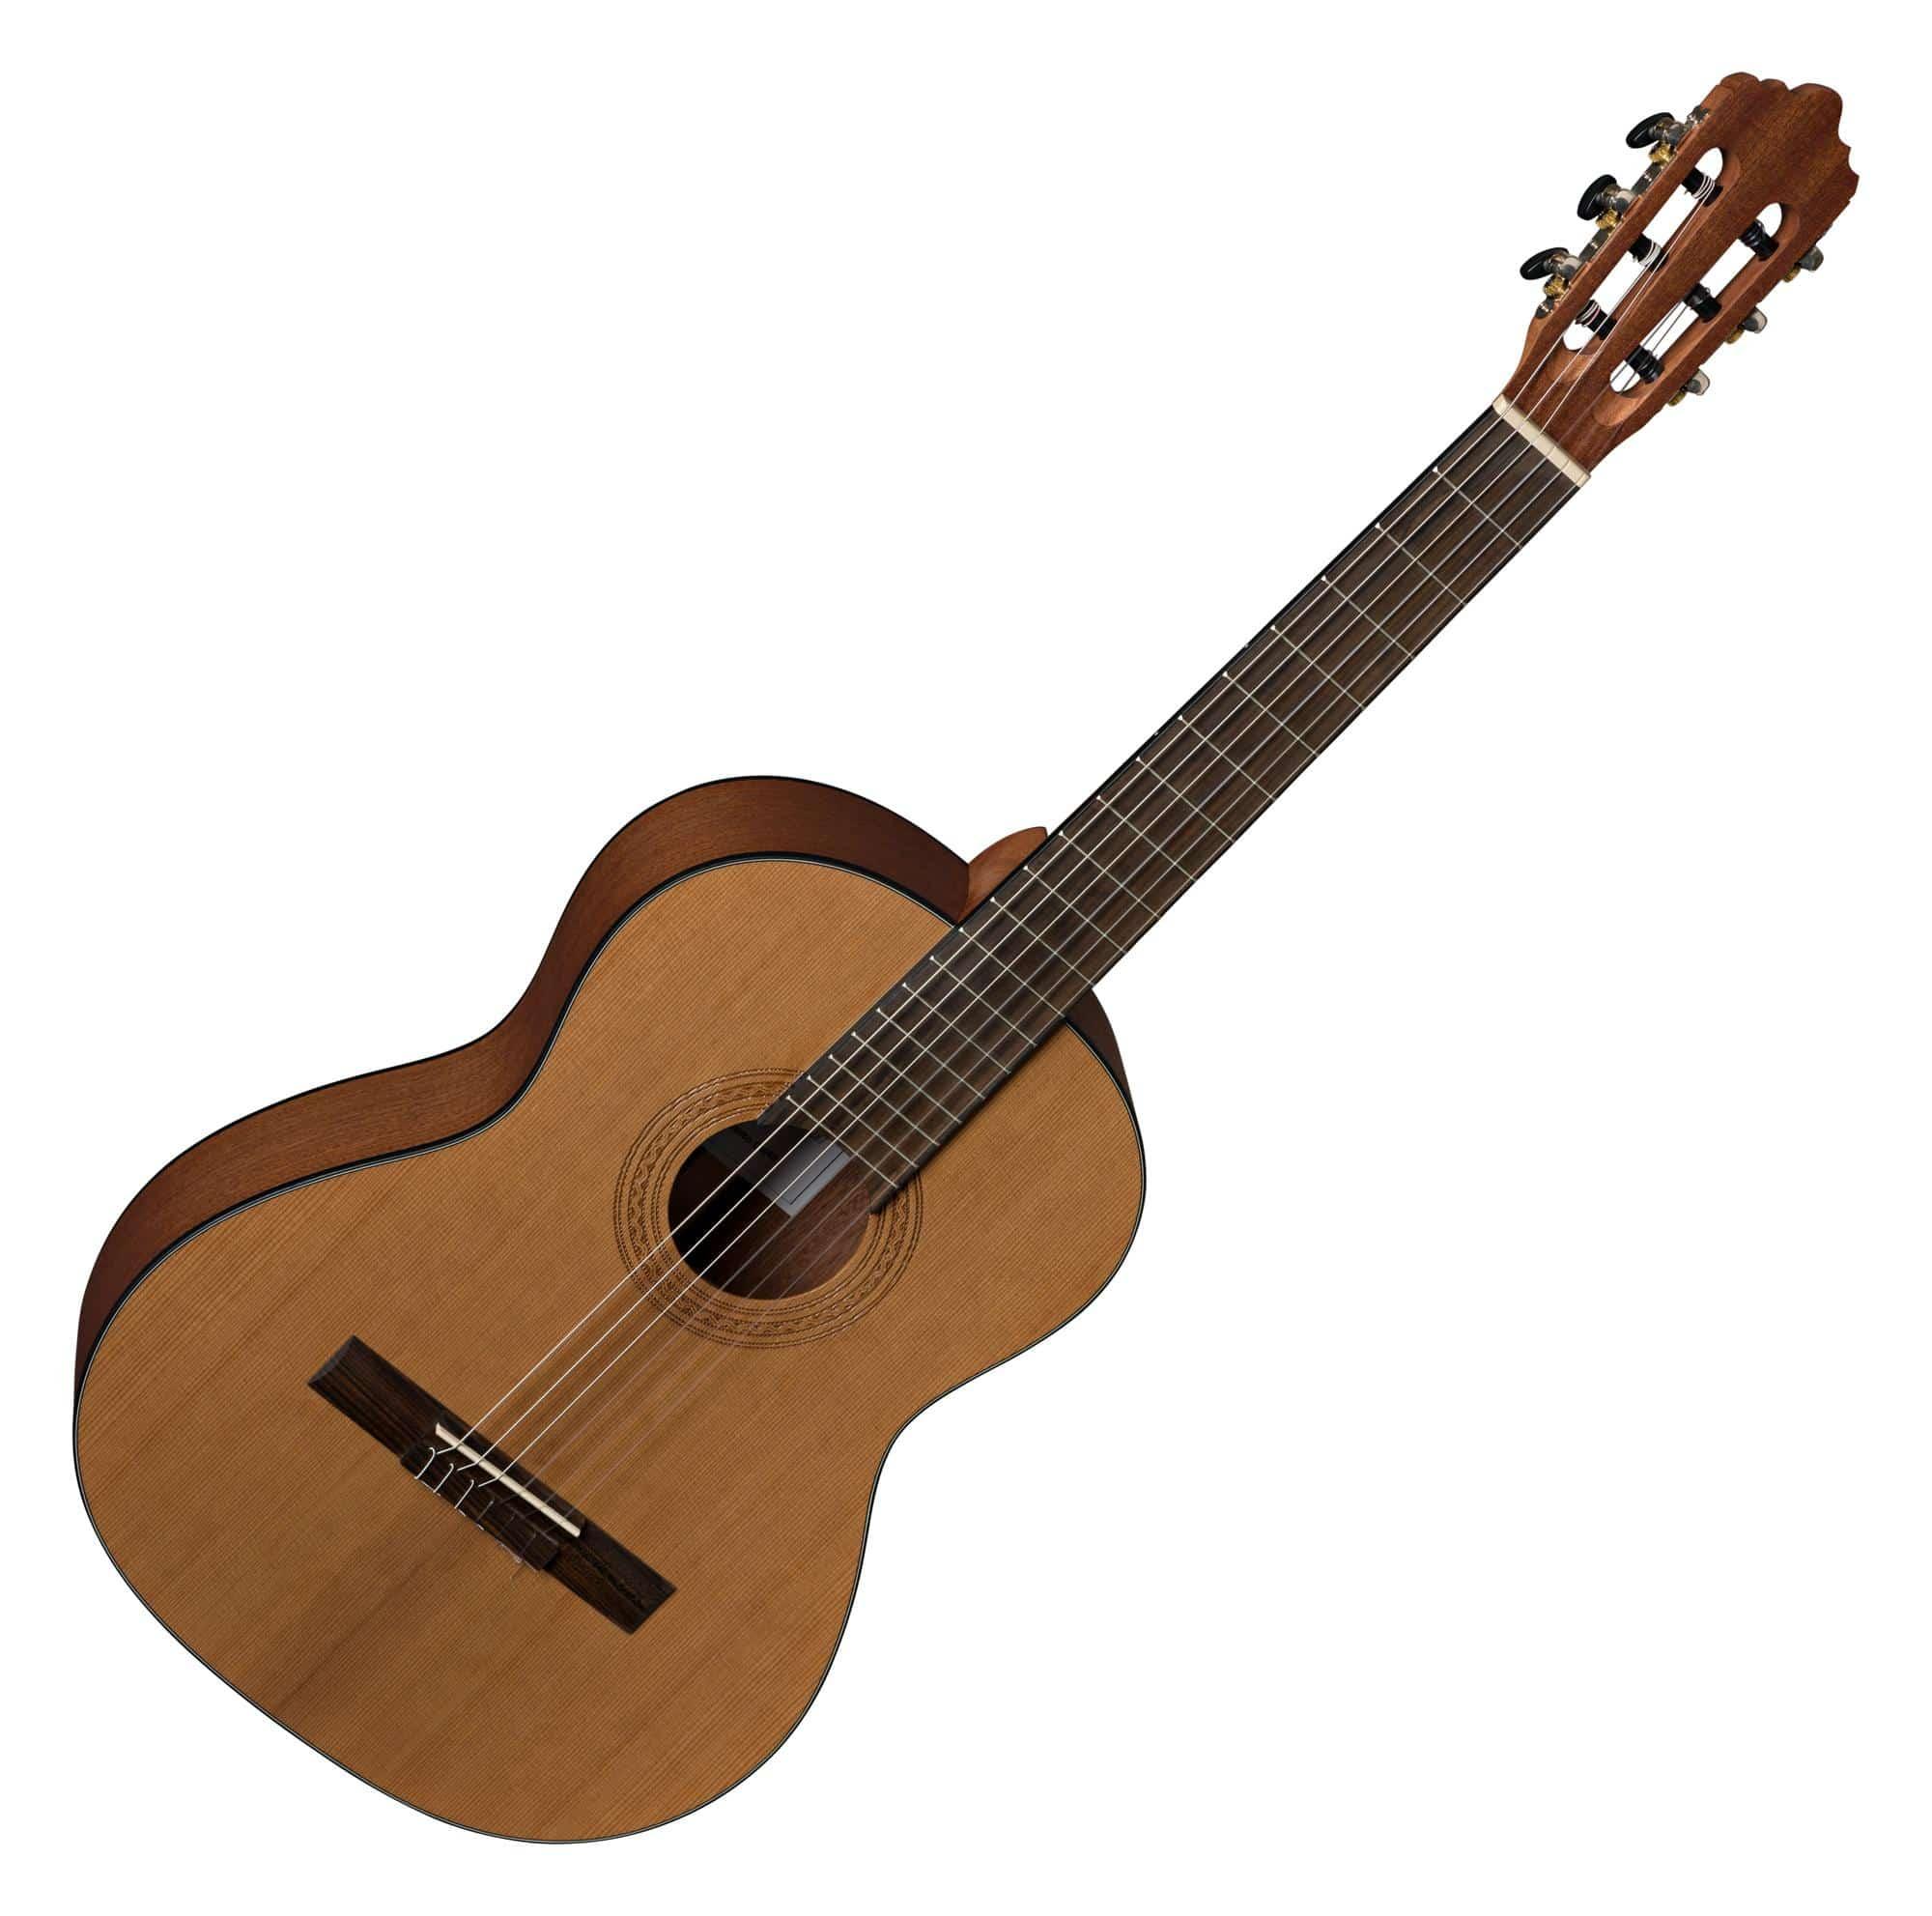 La Mancha Rubinito cm|59 3|4 Konzertgitarre